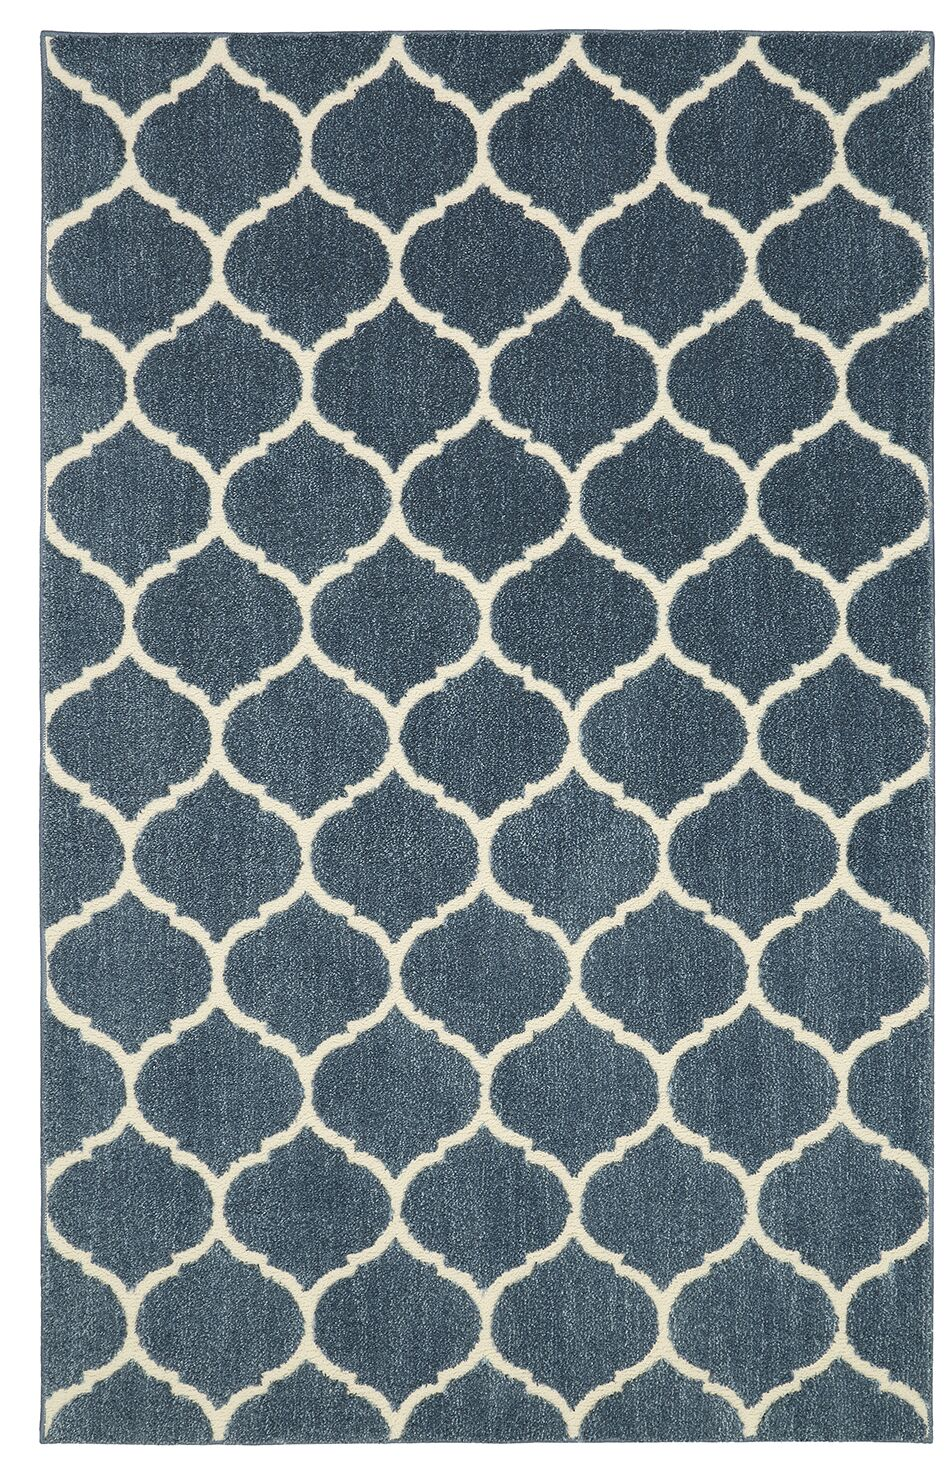 Kalispell Blue Area Rug Rug Size: Rectangle 8' x 10'